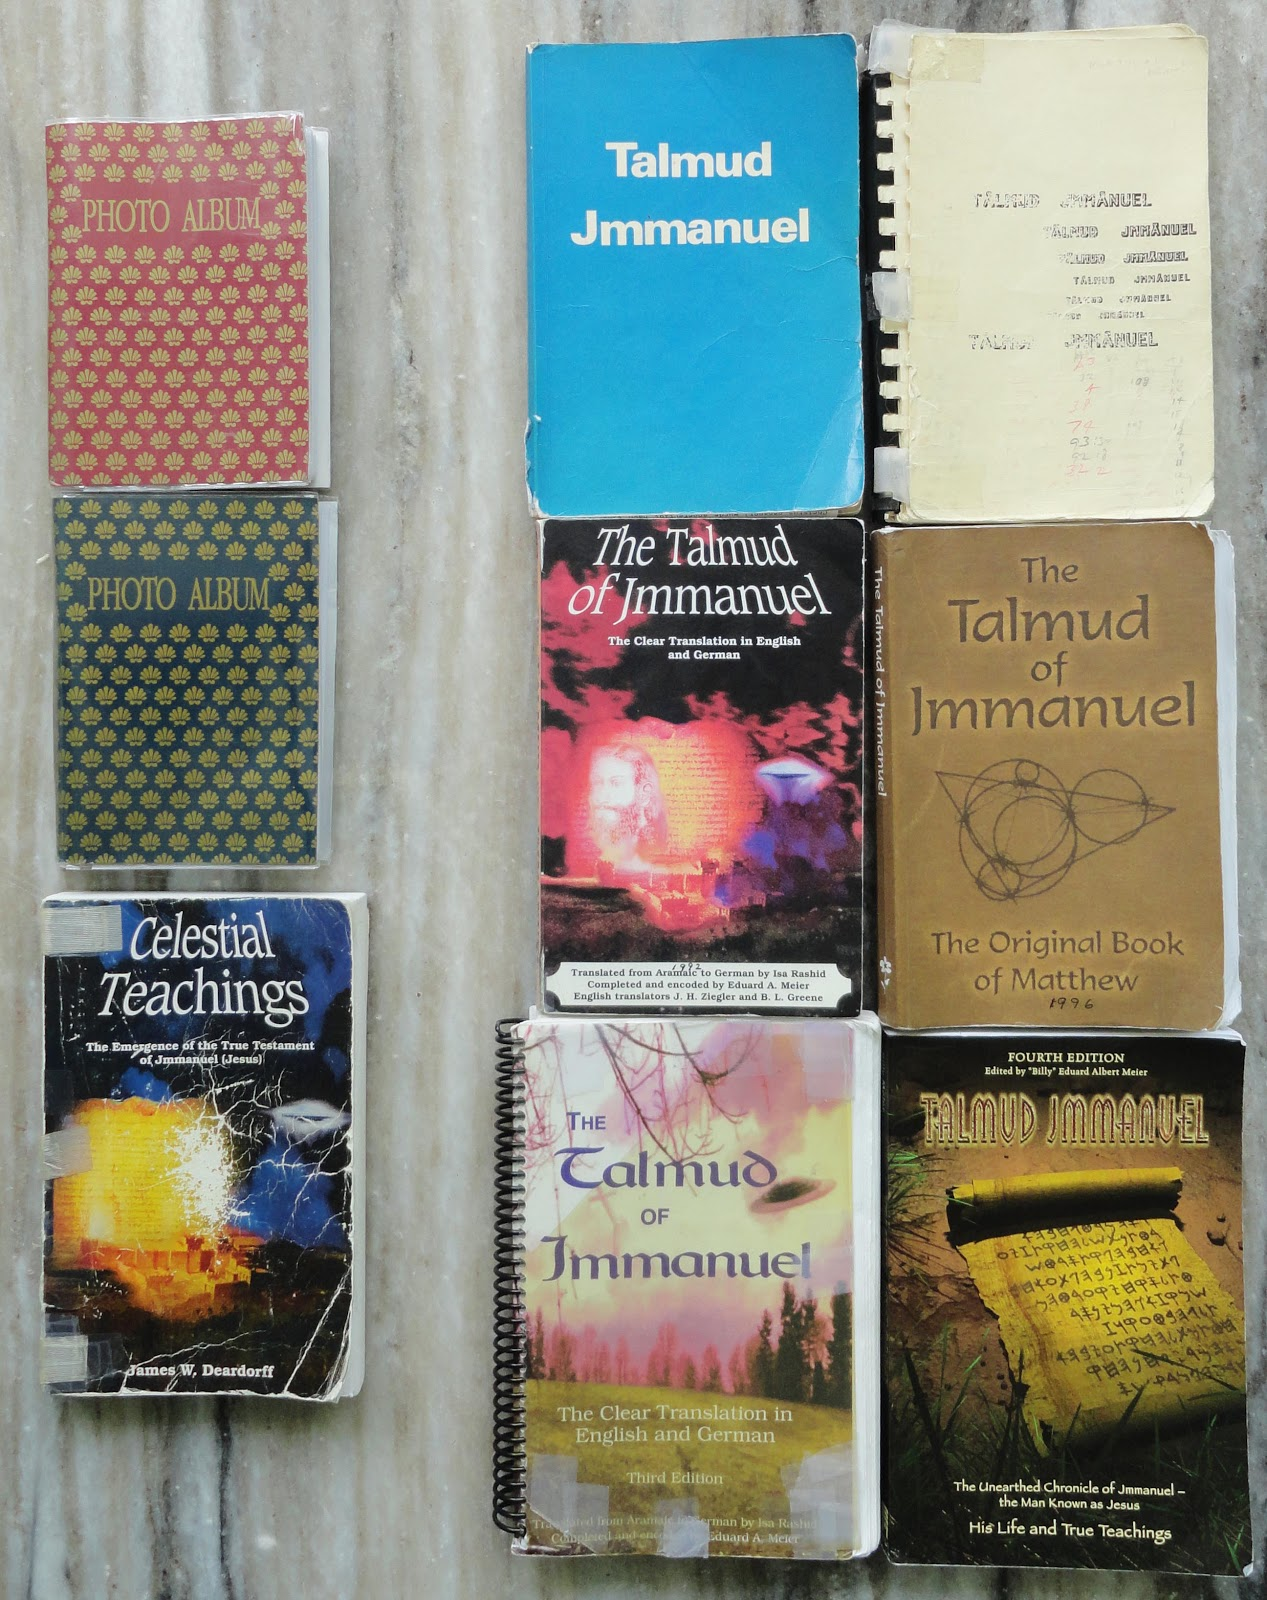 Celestial teachings james deardorff